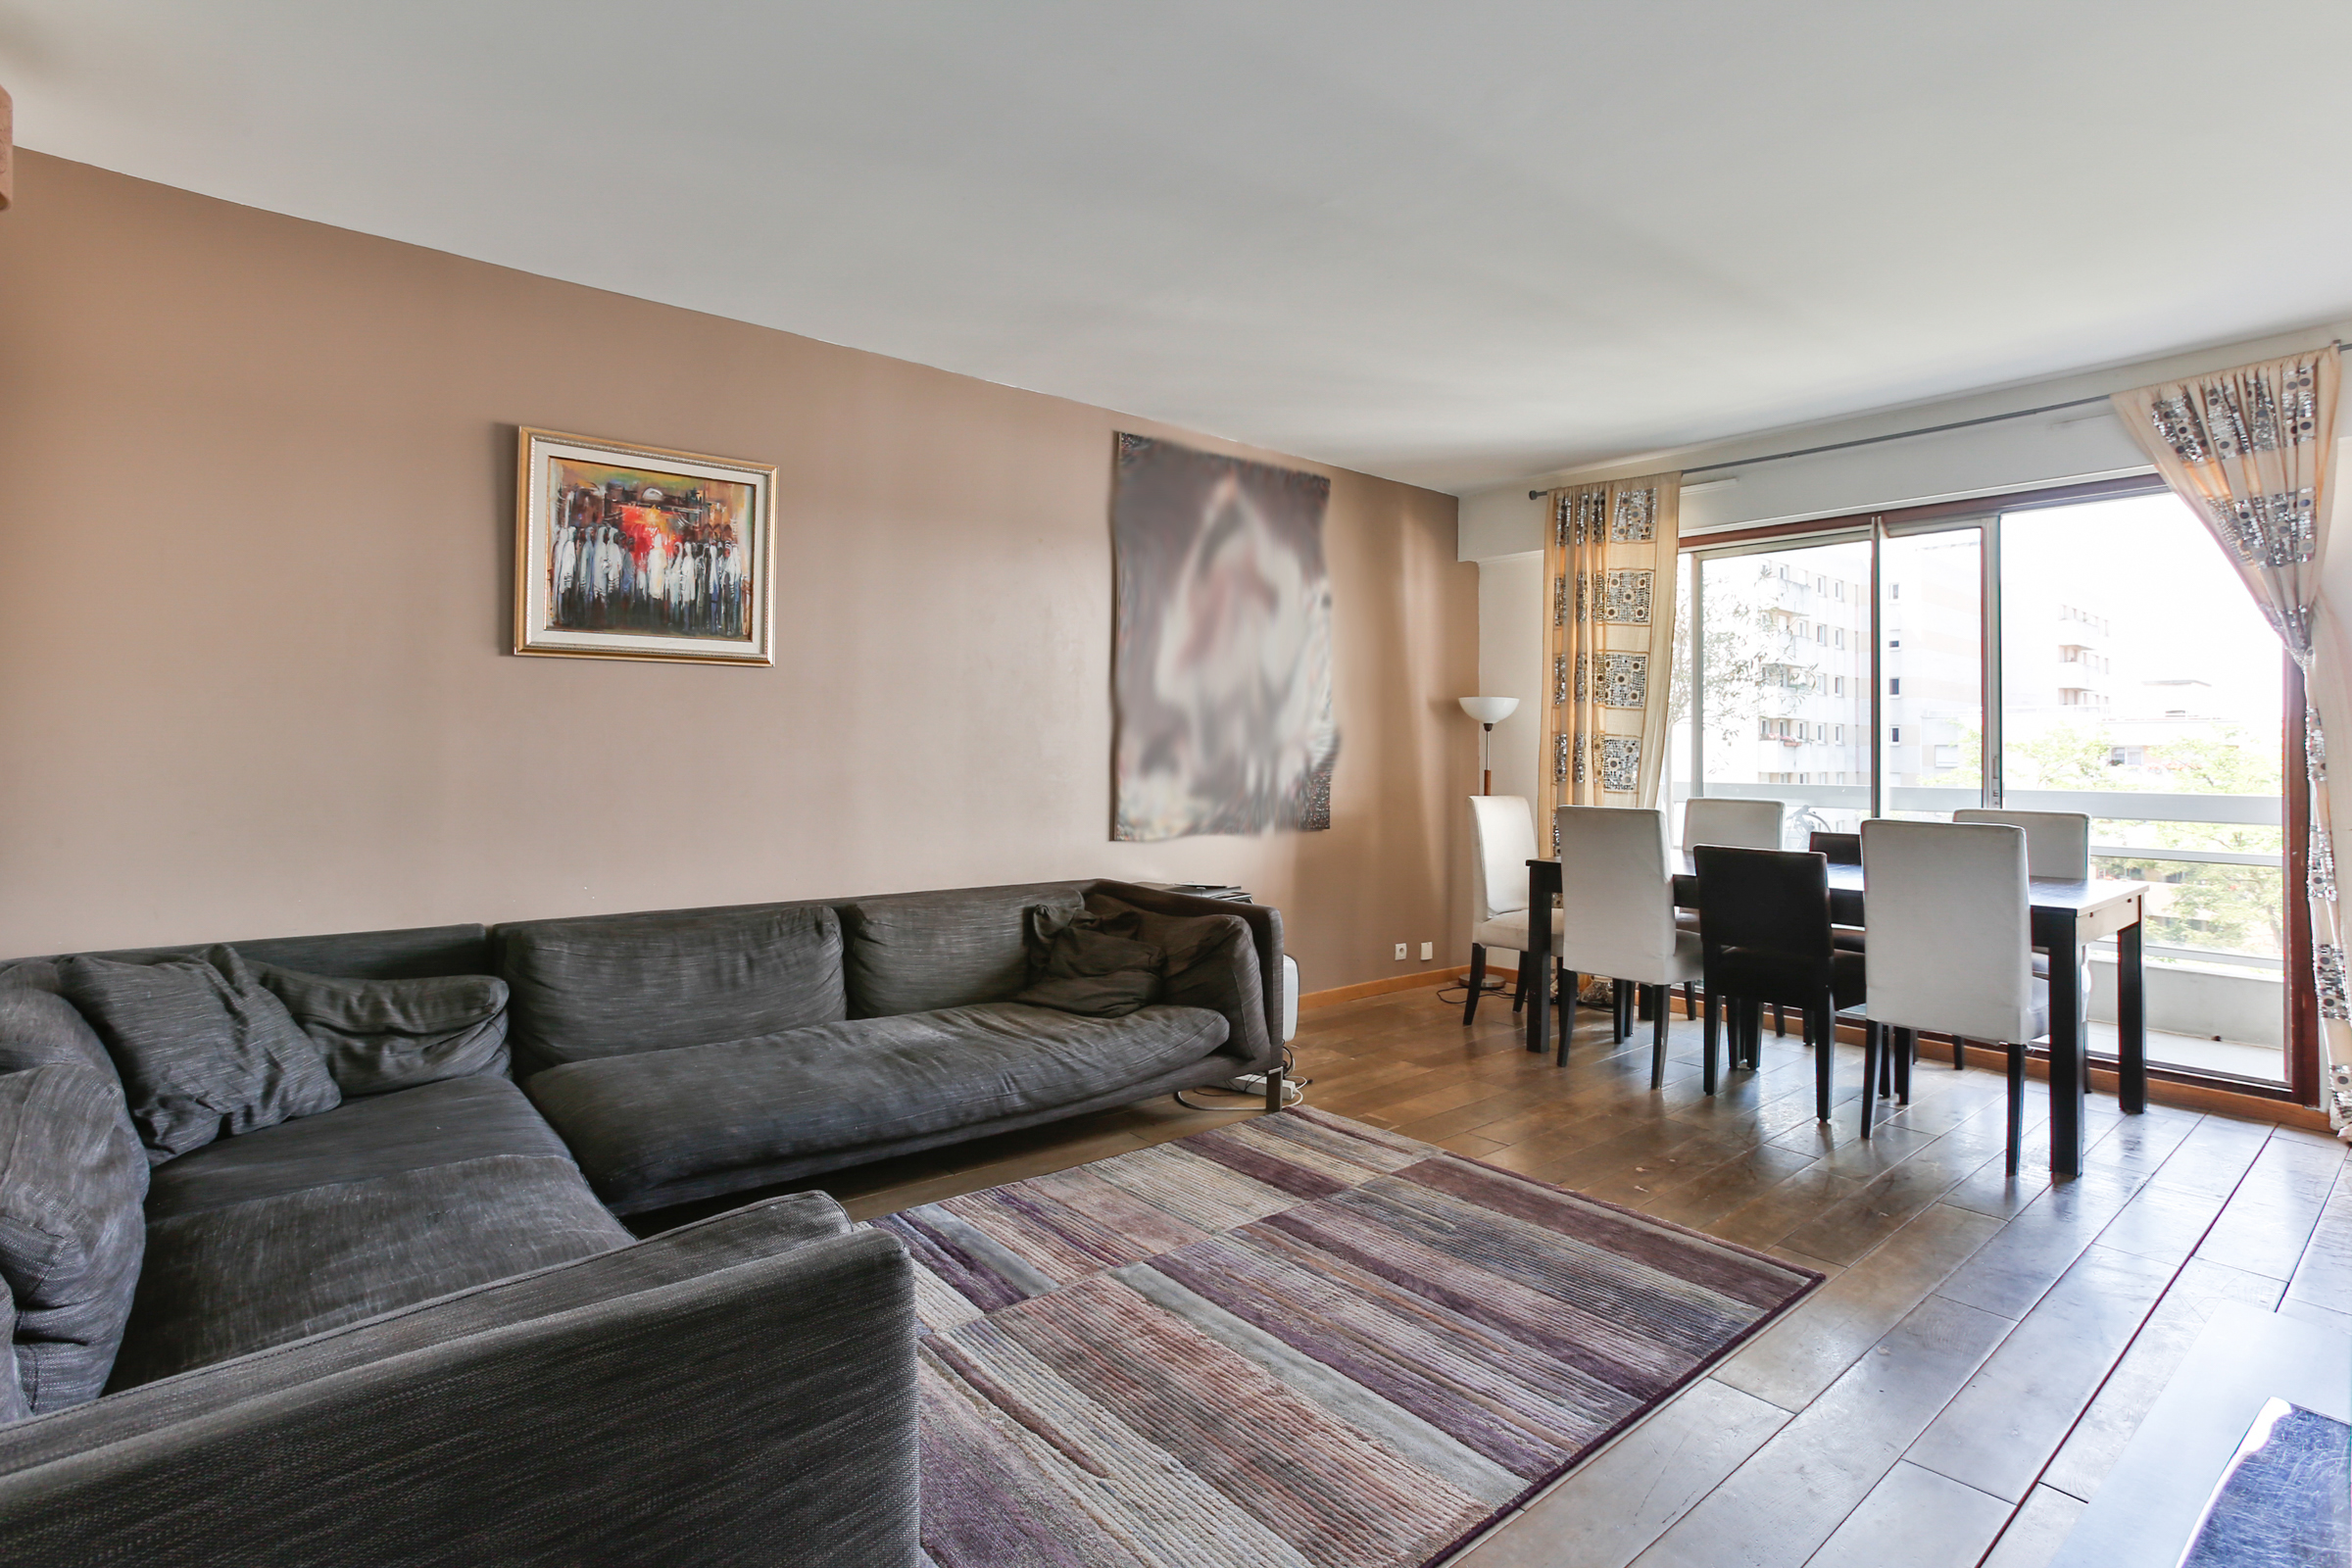 Квартира для того Продажа на Apartment - Oberkampf Paris, Париж 75011 Франция